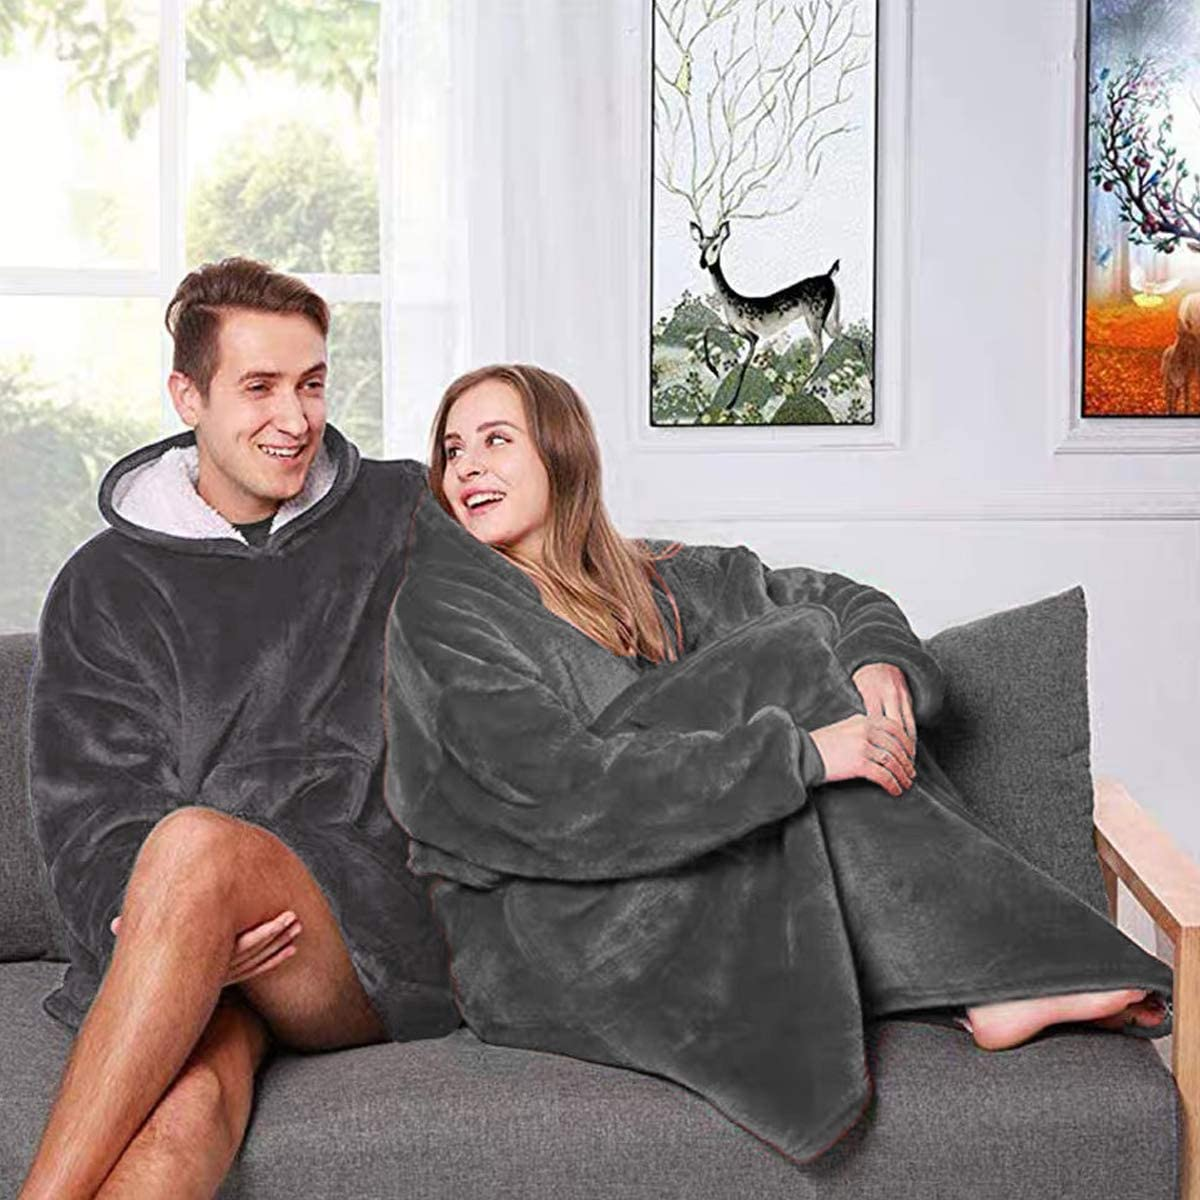 Nappo Hoodie Blanket Sweatshirt, Wearable Sherpa Fleece Oversized TV-Blanket